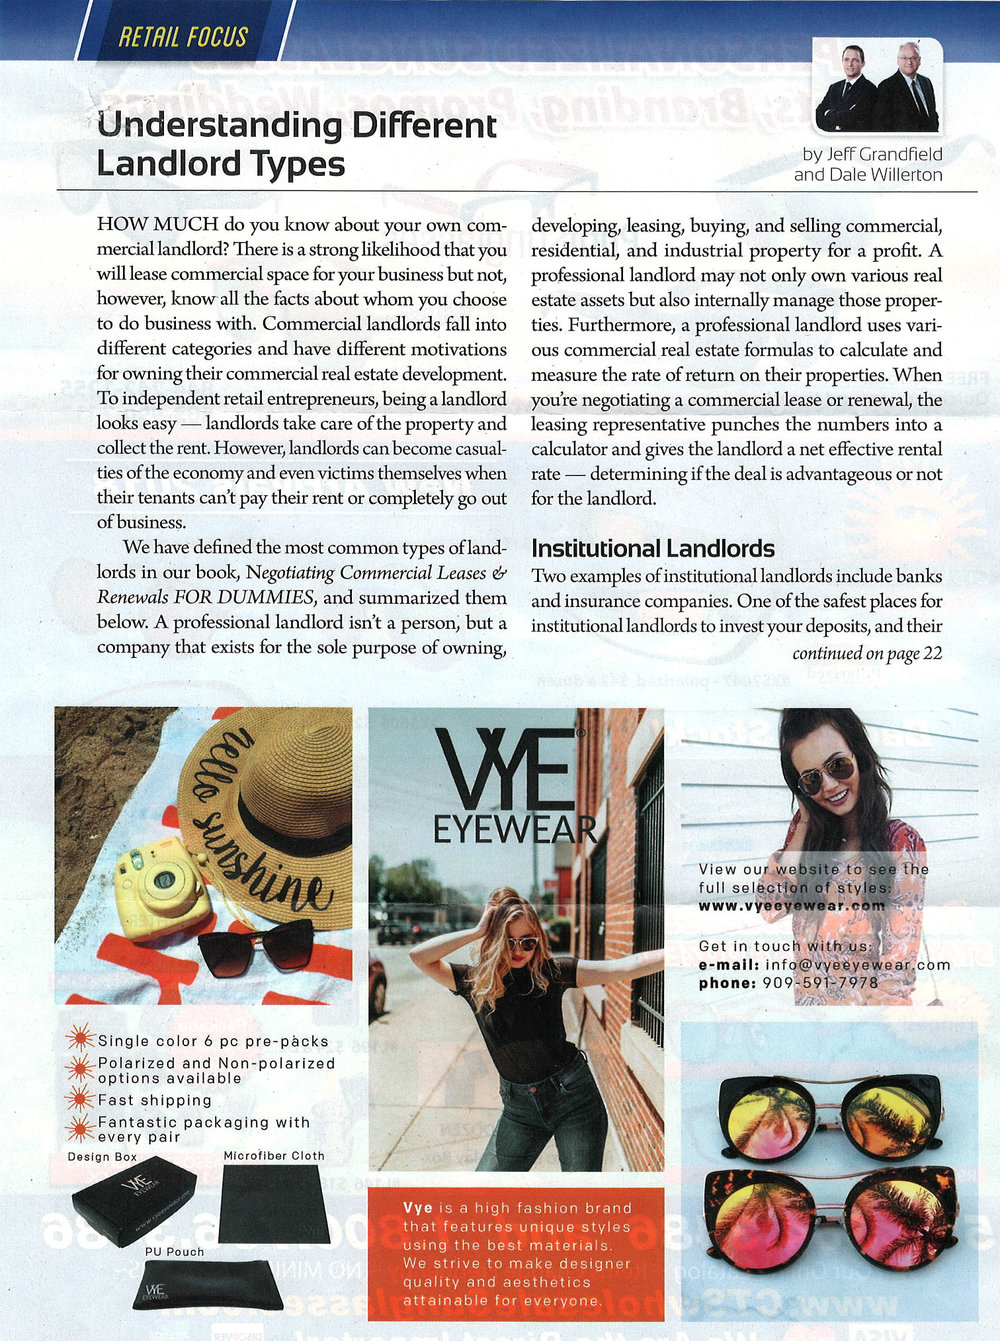 Independent Retailer Magazine